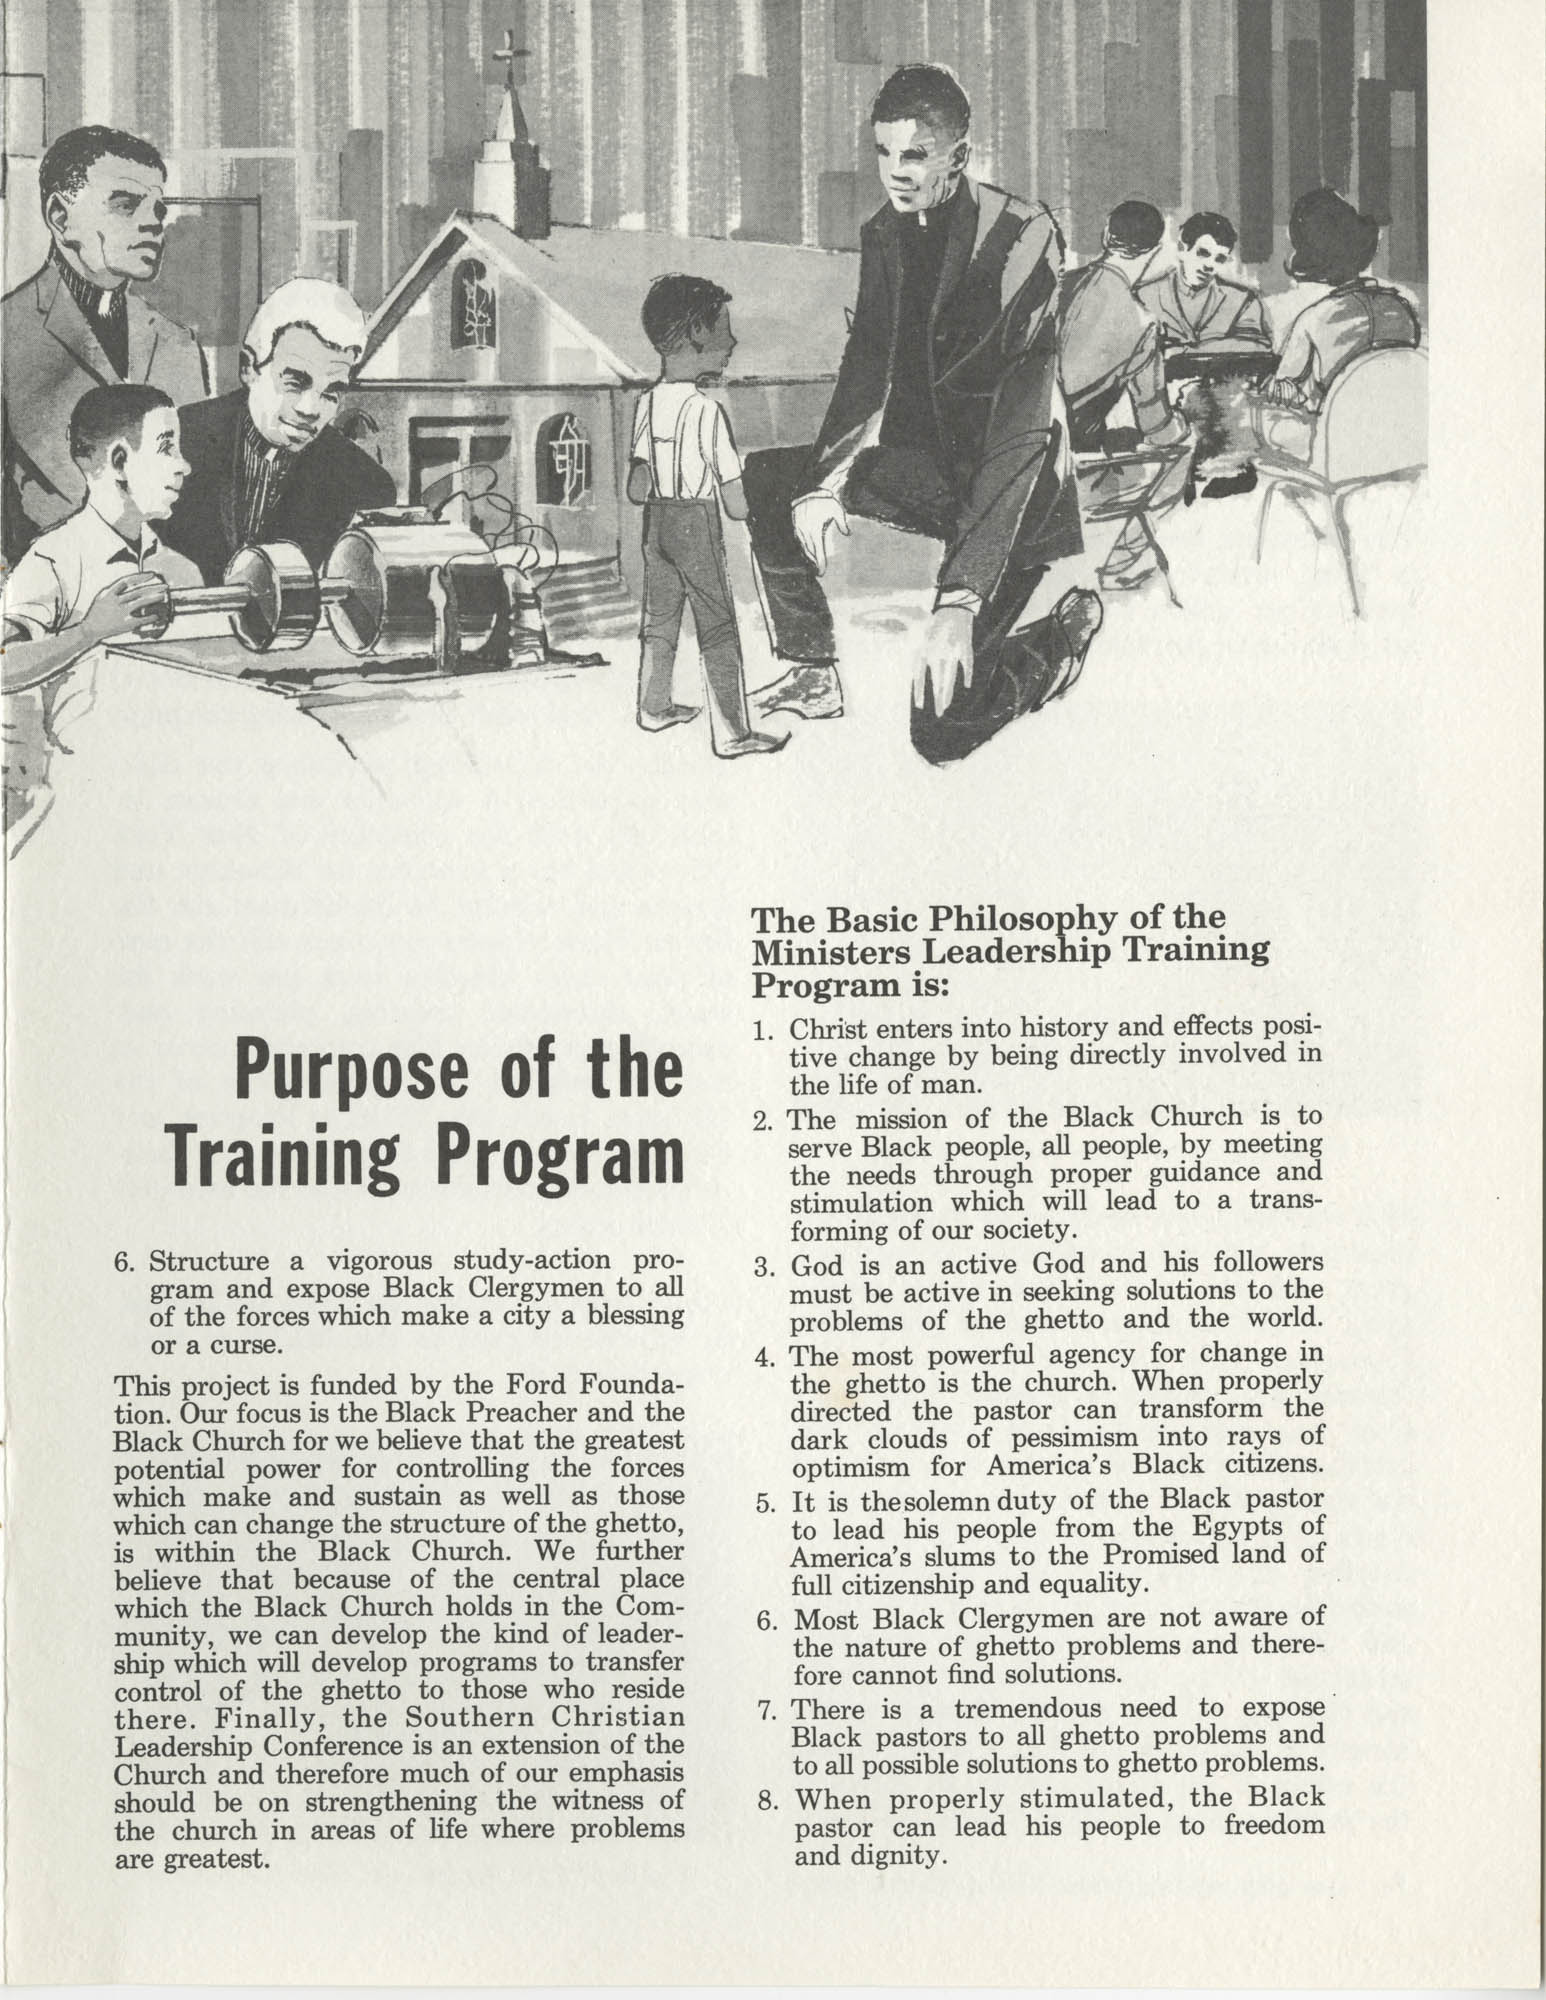 Ministers Leadership Training Program, Page 2